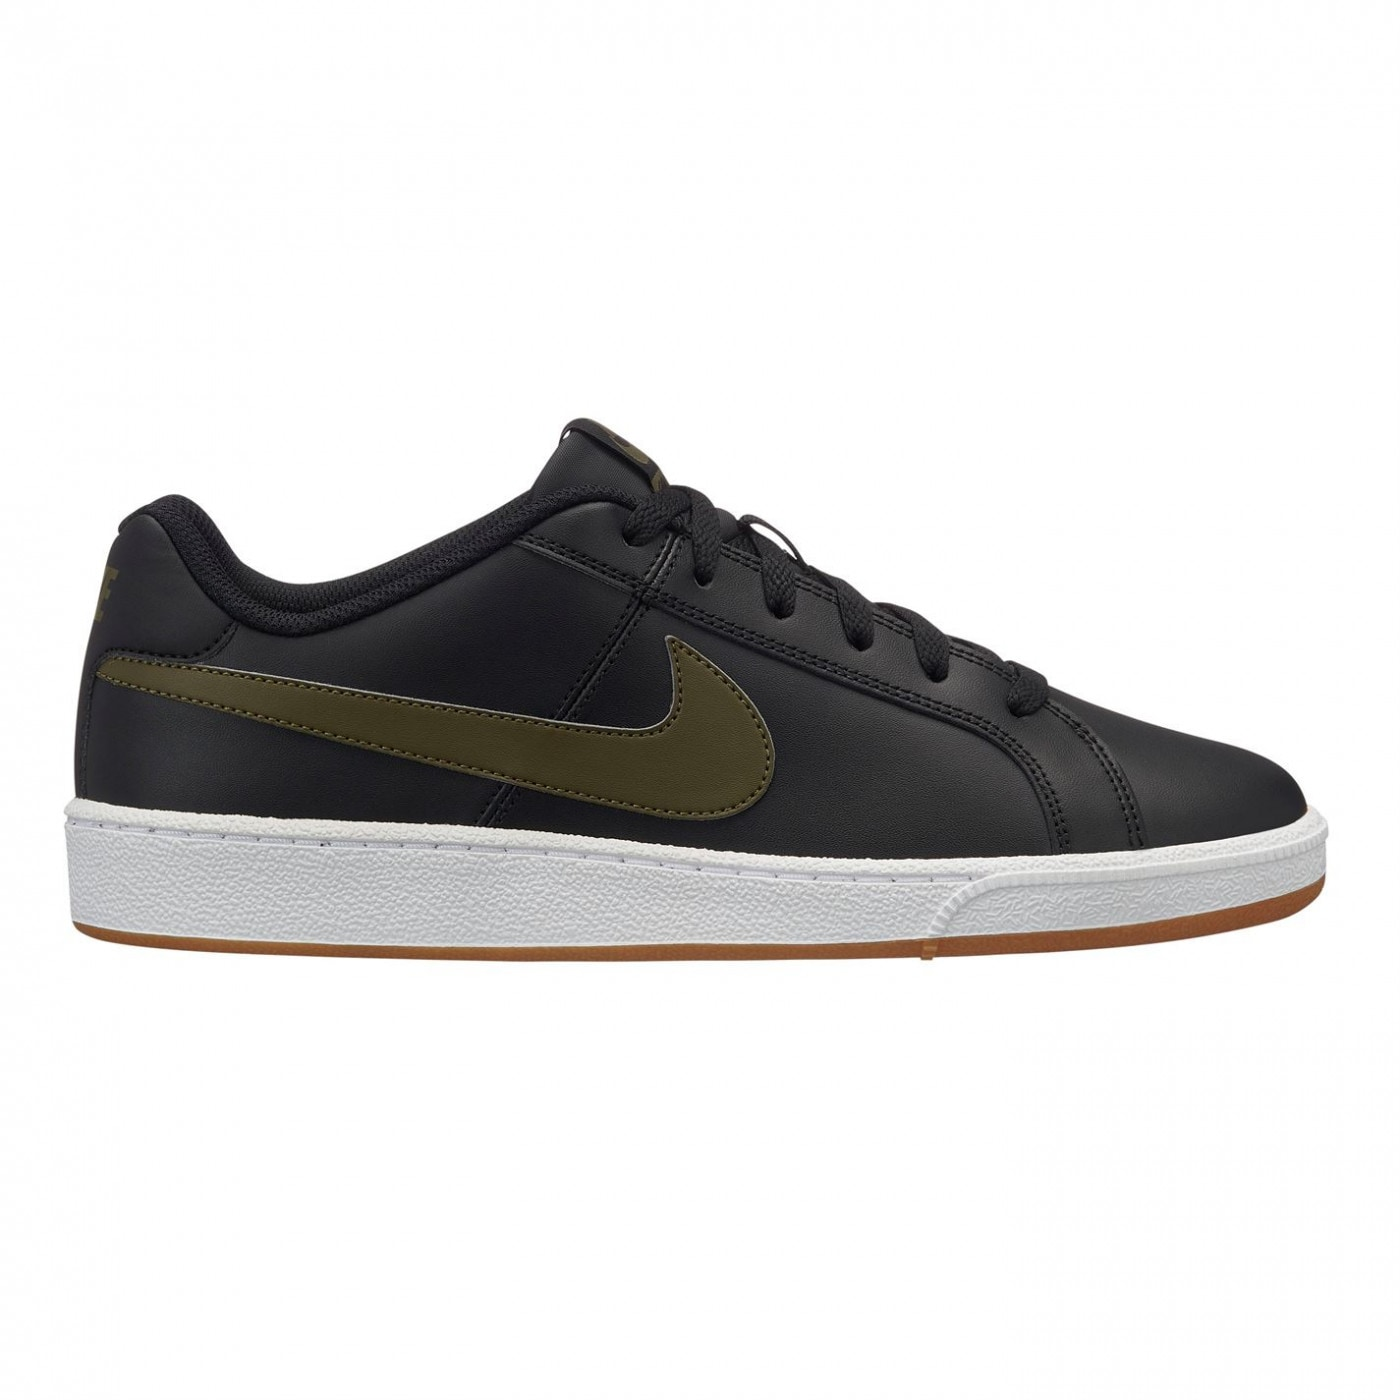 477734e5b24 Nike Court Royale Mens Trainers - FACTCOOL